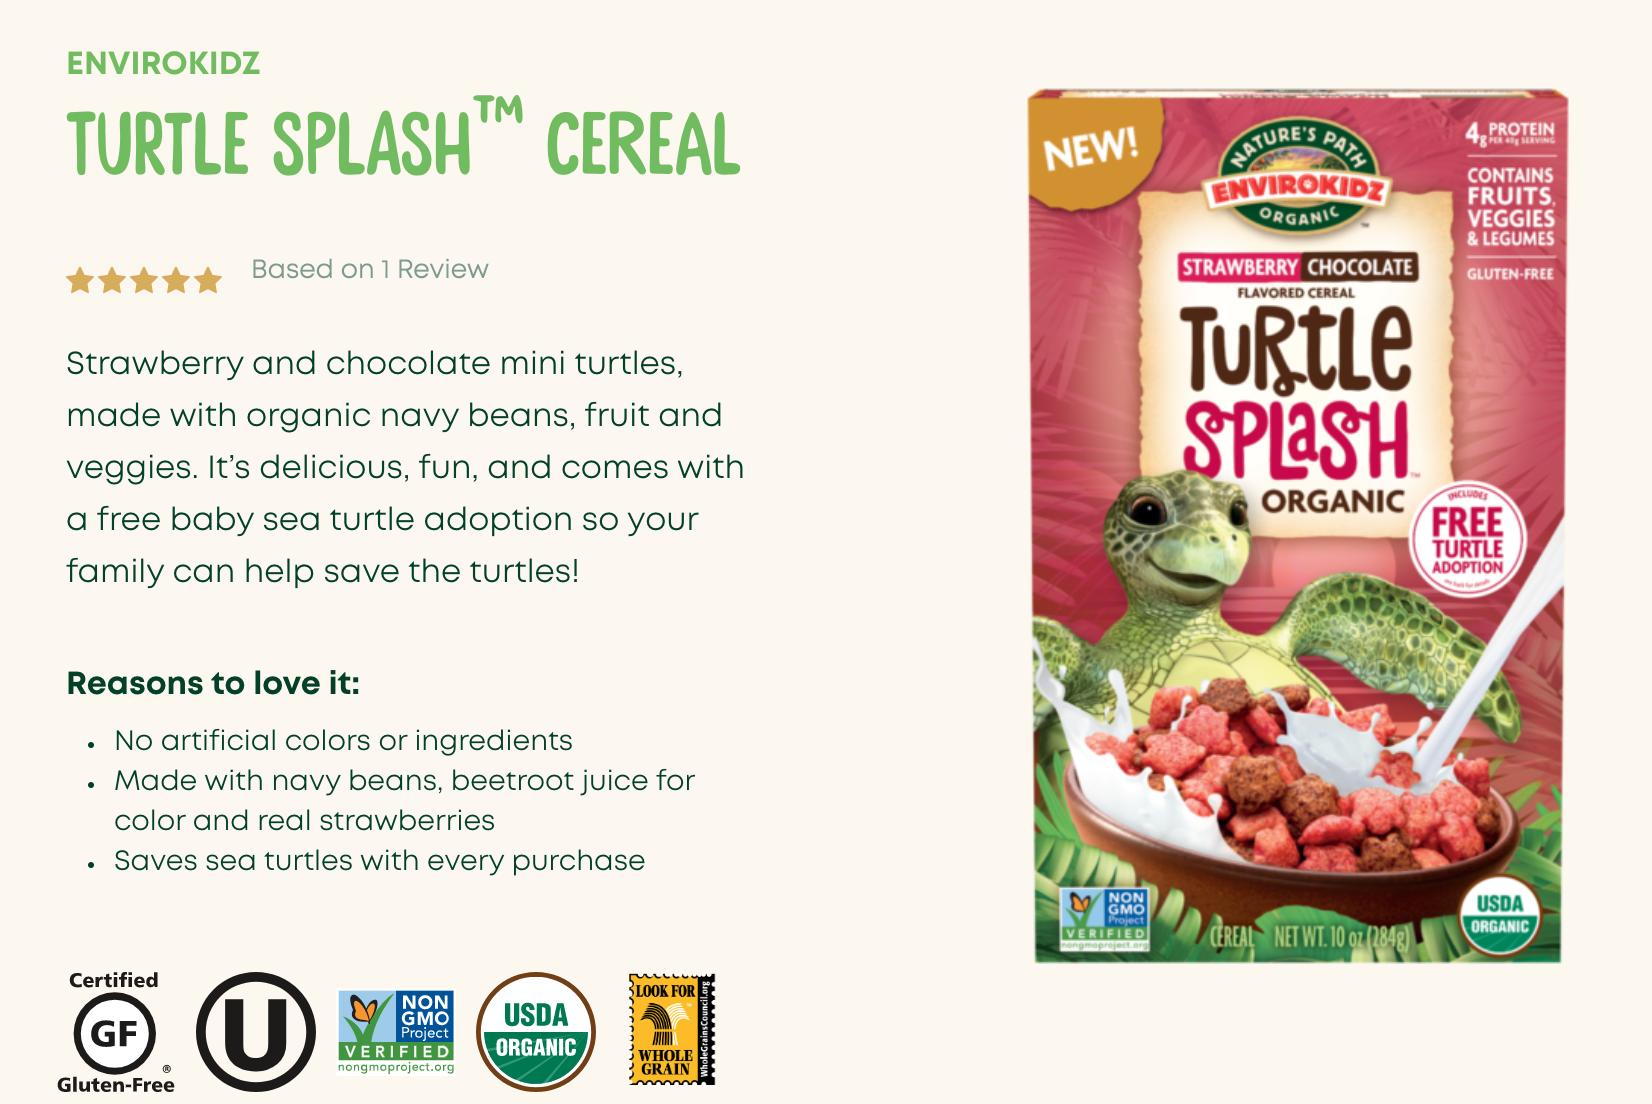 New Cereal Turtle Splash!